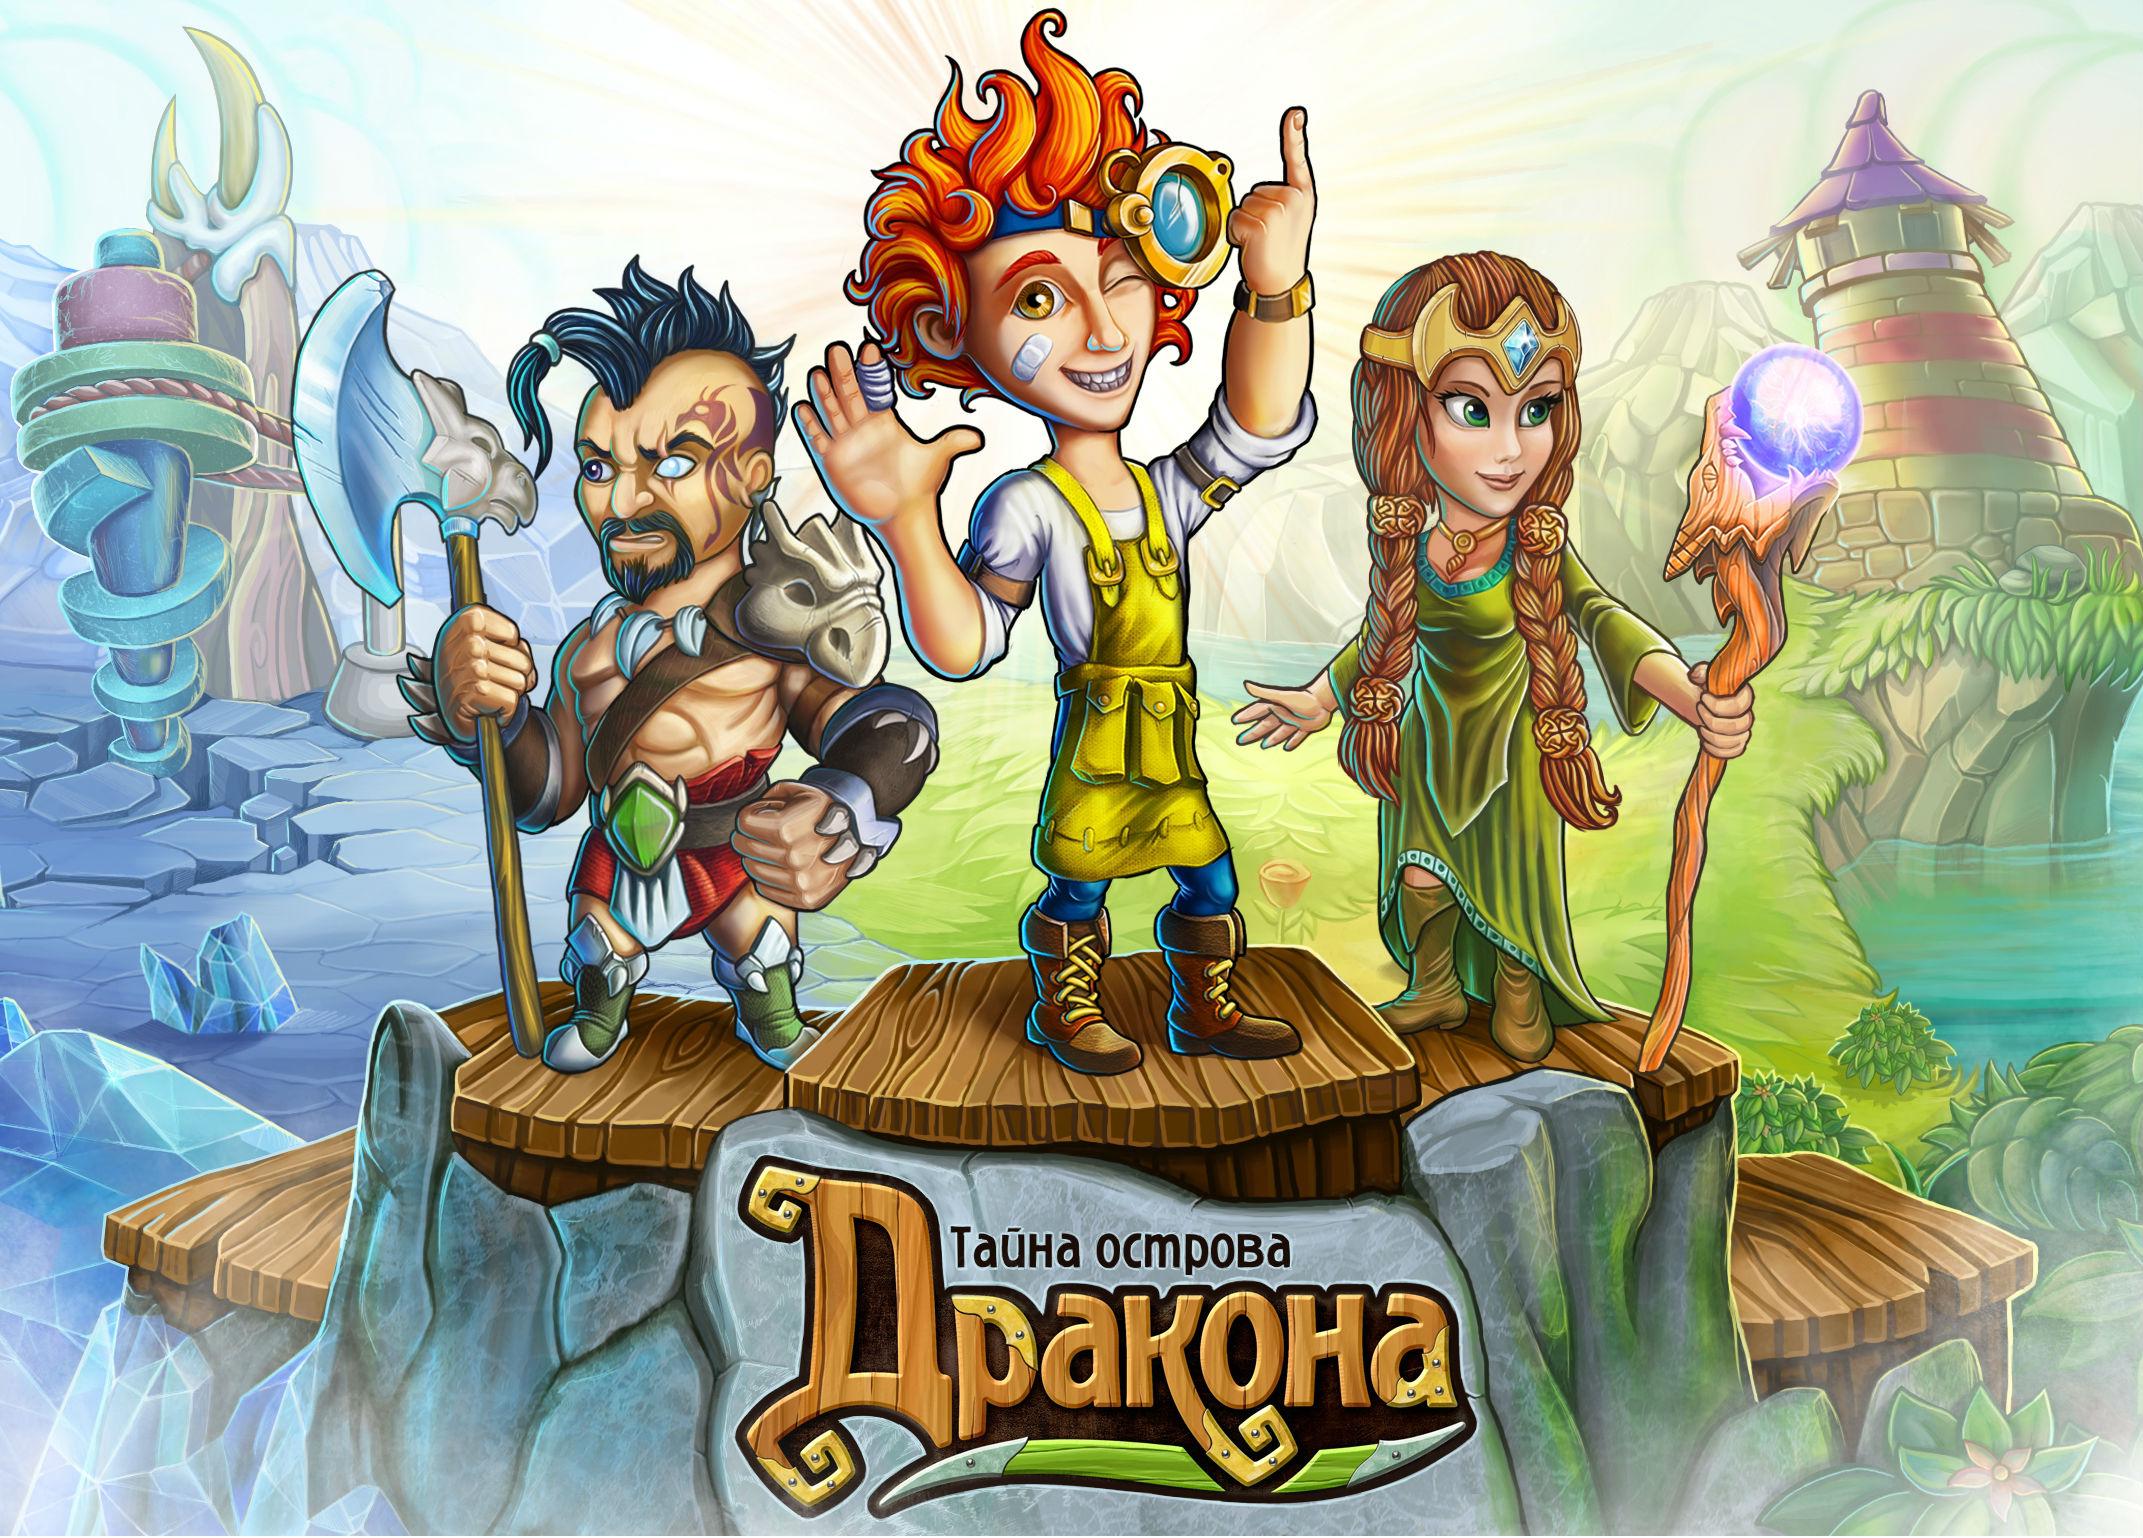 Игра «Тайна острова Дракона»: приключения, поиски и общение